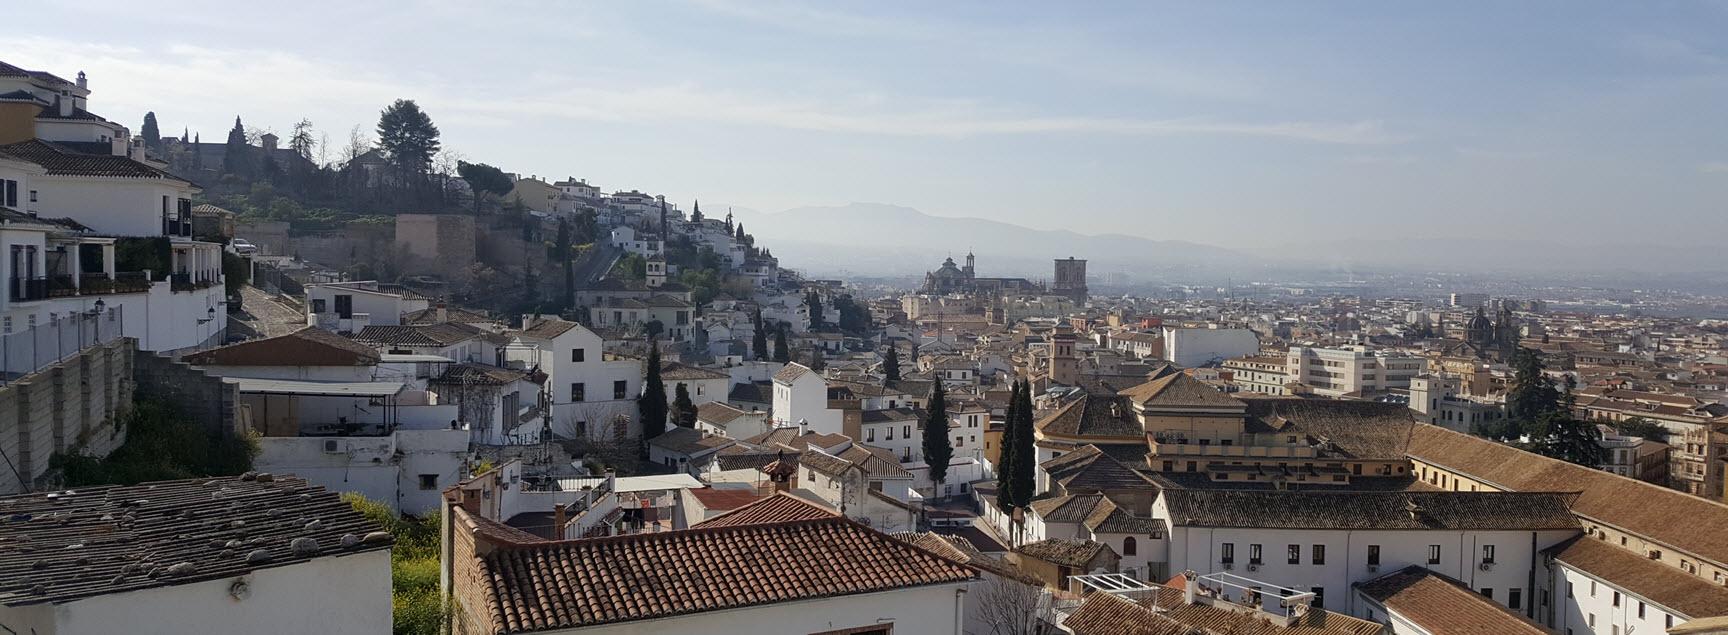 Granada - 2019